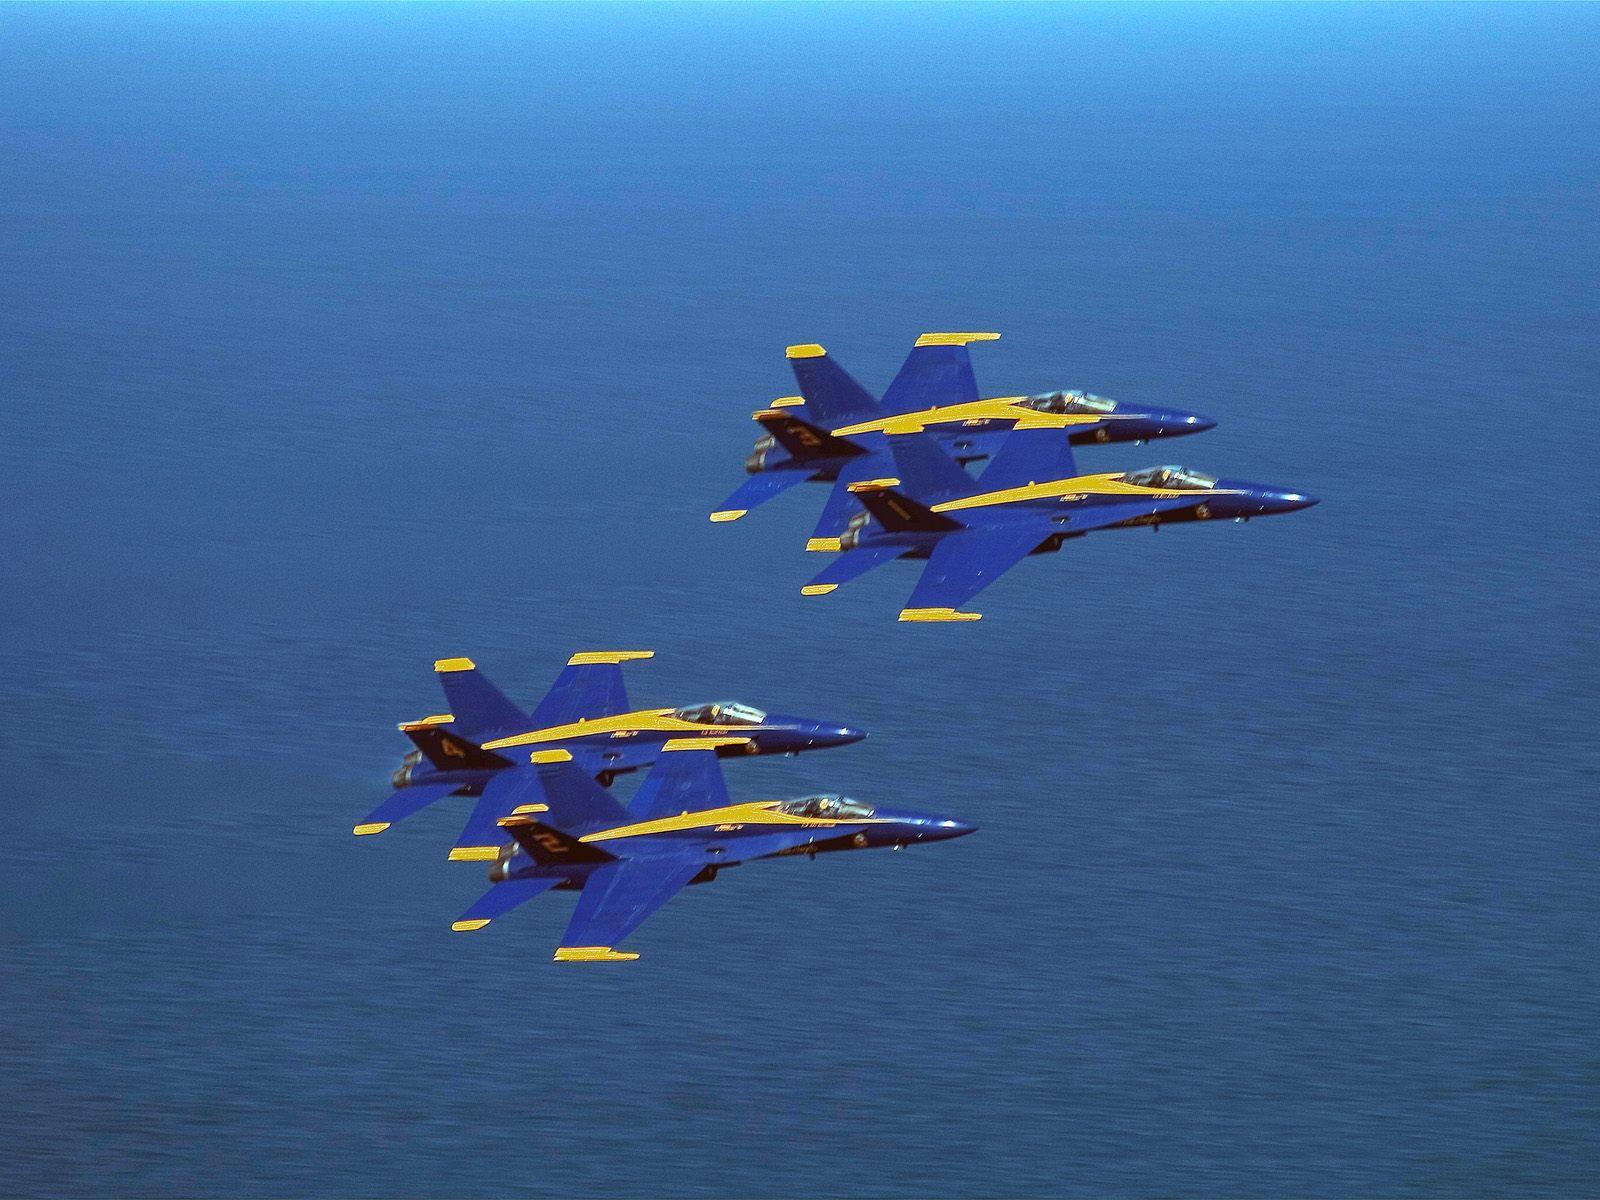 Desktop wallpaper downloads plane fighter Fighter Planes   Huge 1600x1200